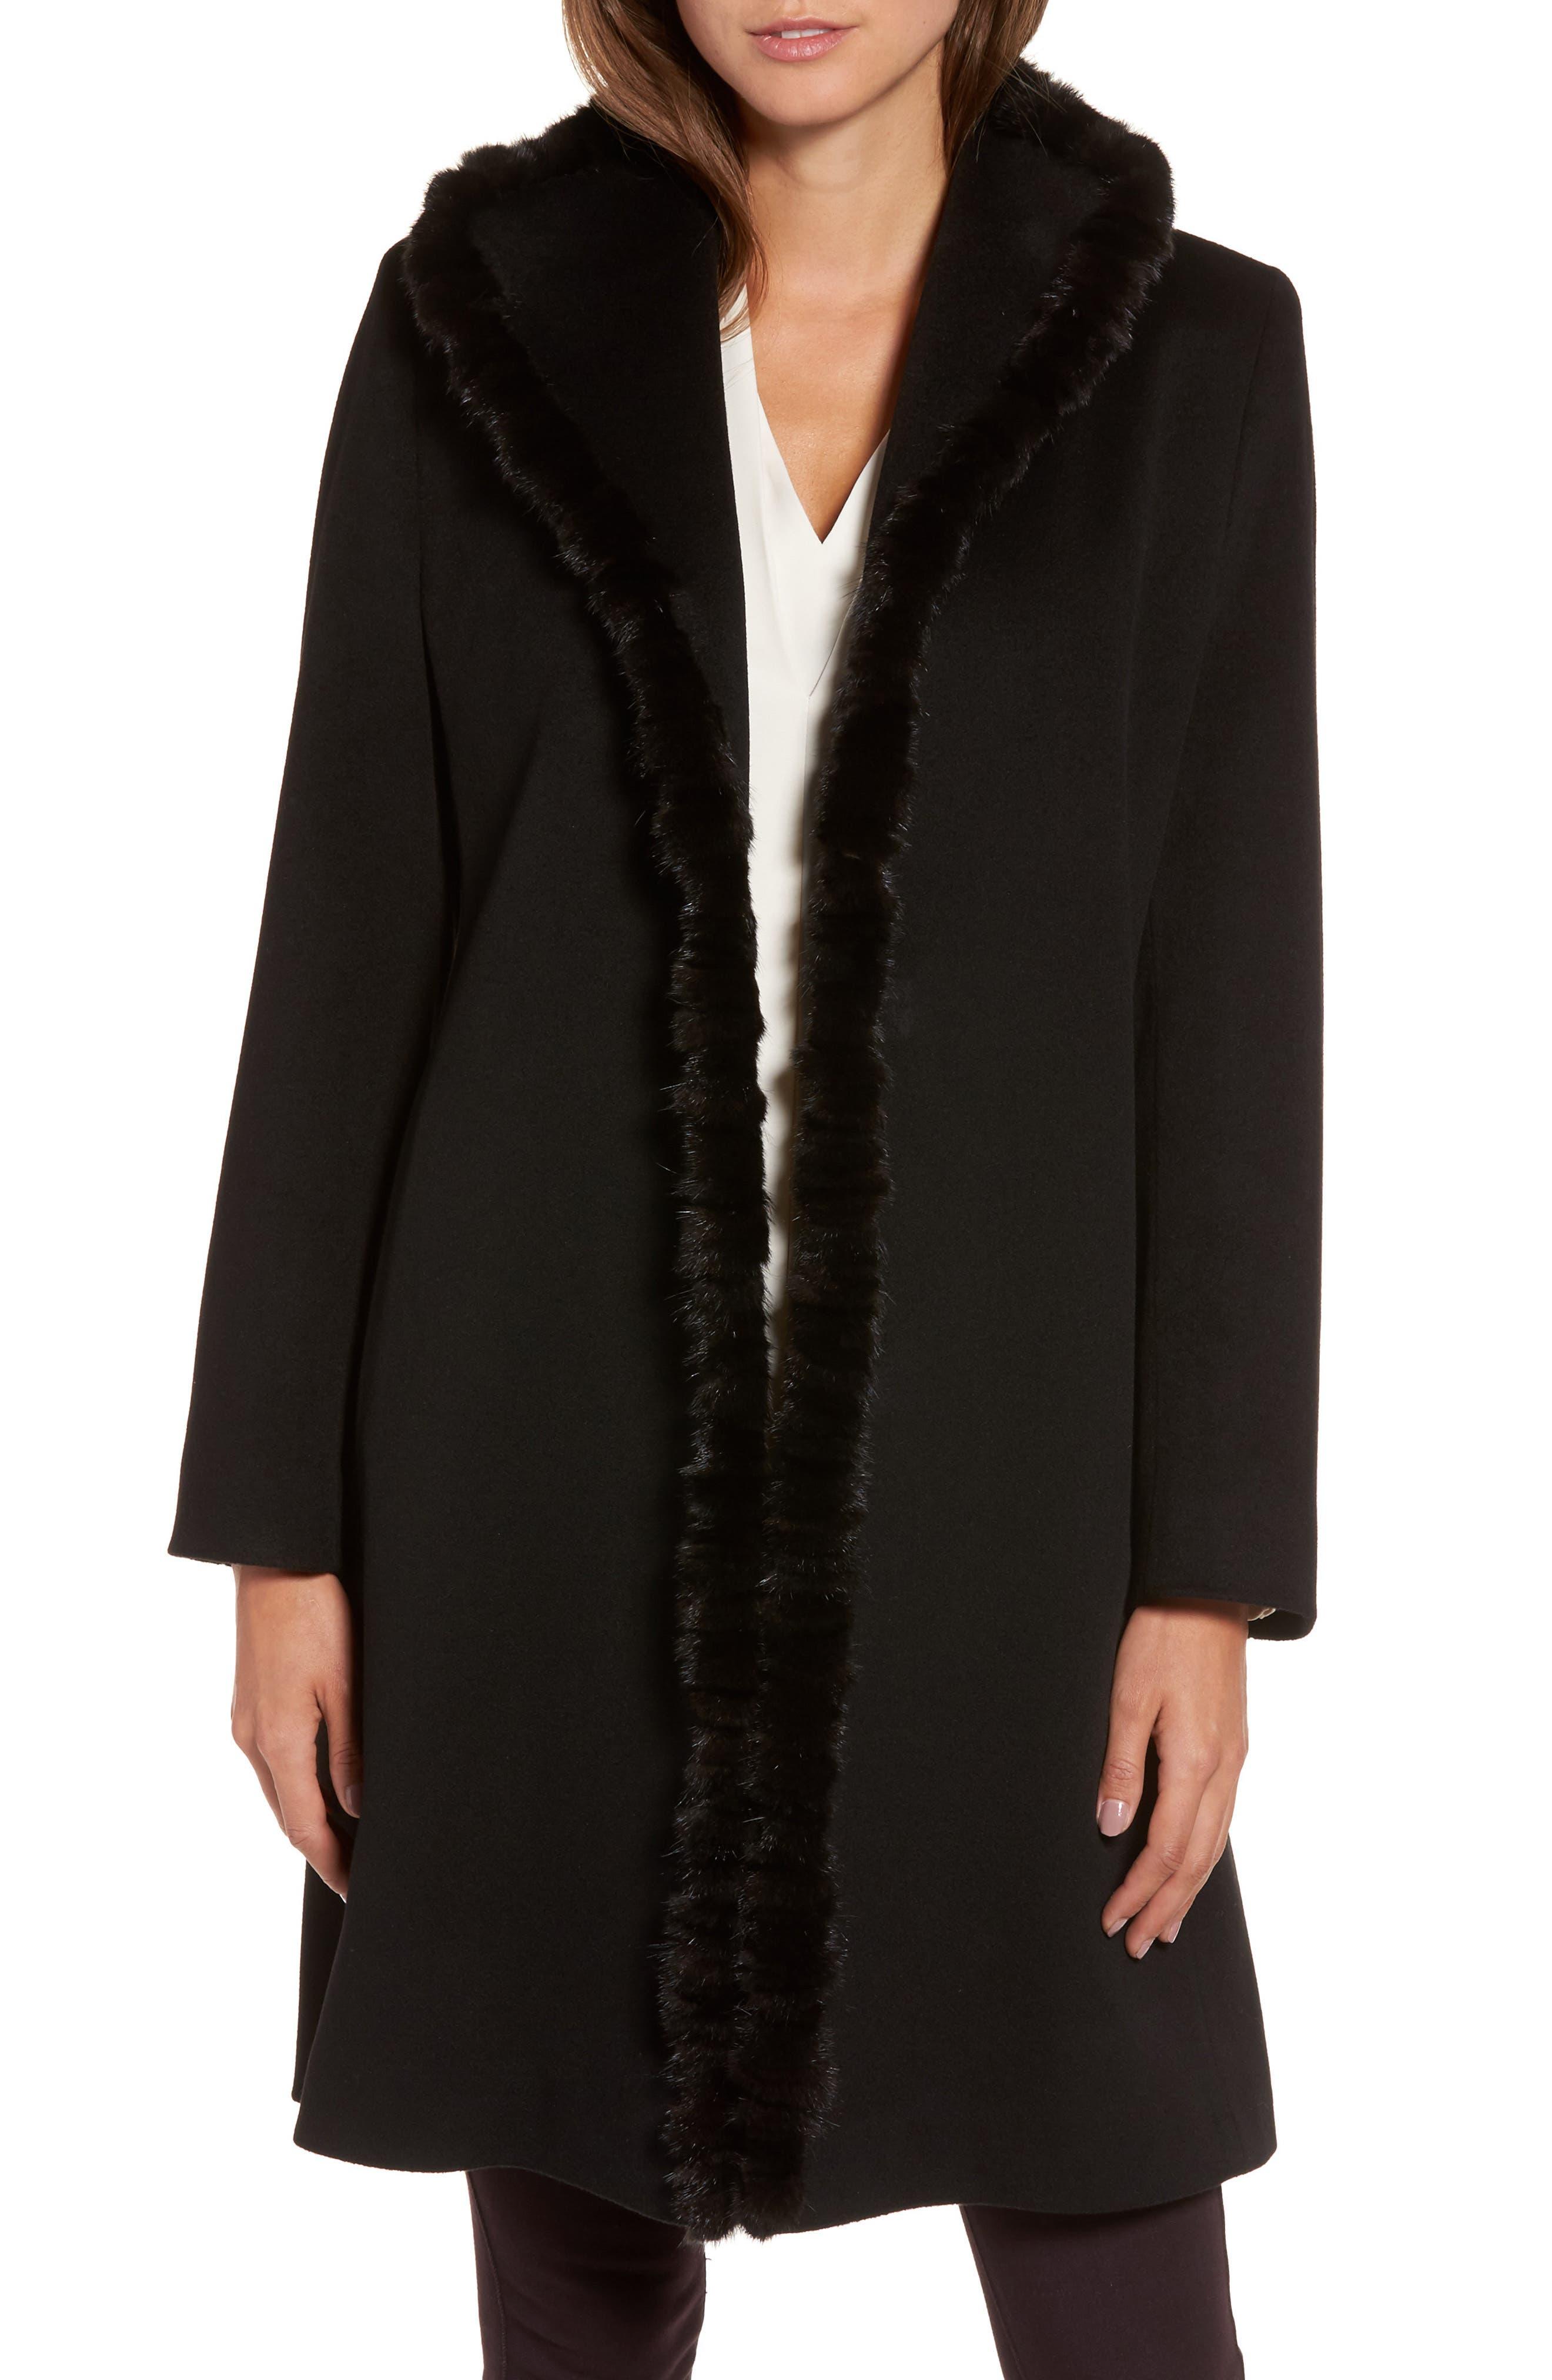 Loro Piana Wool Wing Collar Coat with Genuine Mink Trim,                             Main thumbnail 1, color,                             Black